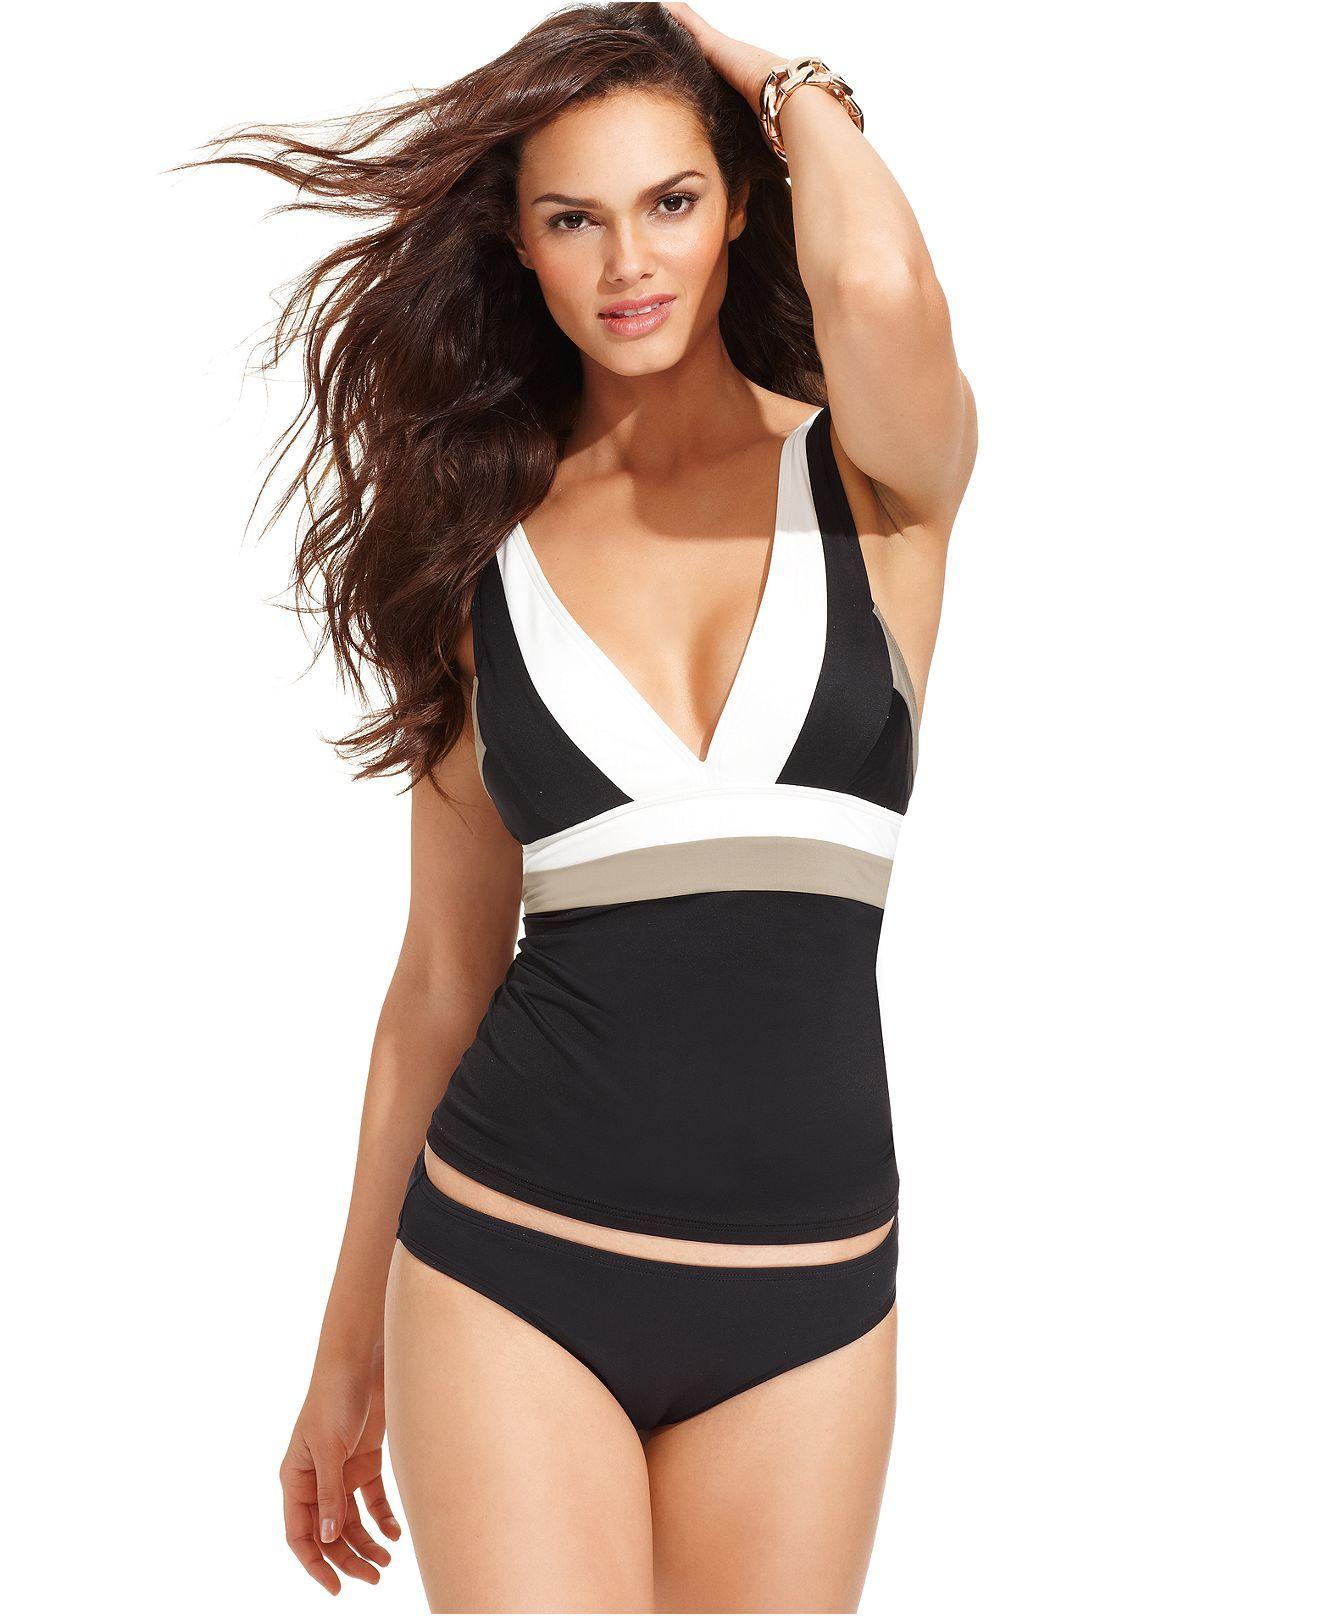 789488c940 DKNY Swimsuit, Colorblock Tankini Top & Solid Brief Bottom - Swimwear -  Women - Macys